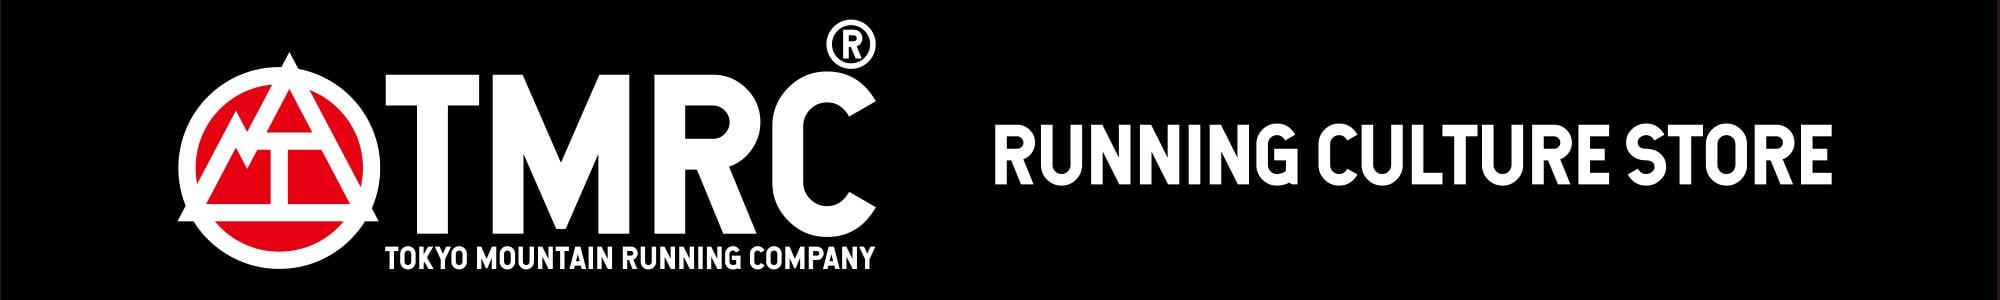 TOKYO MOUNTAIN RUNNING COMPANY